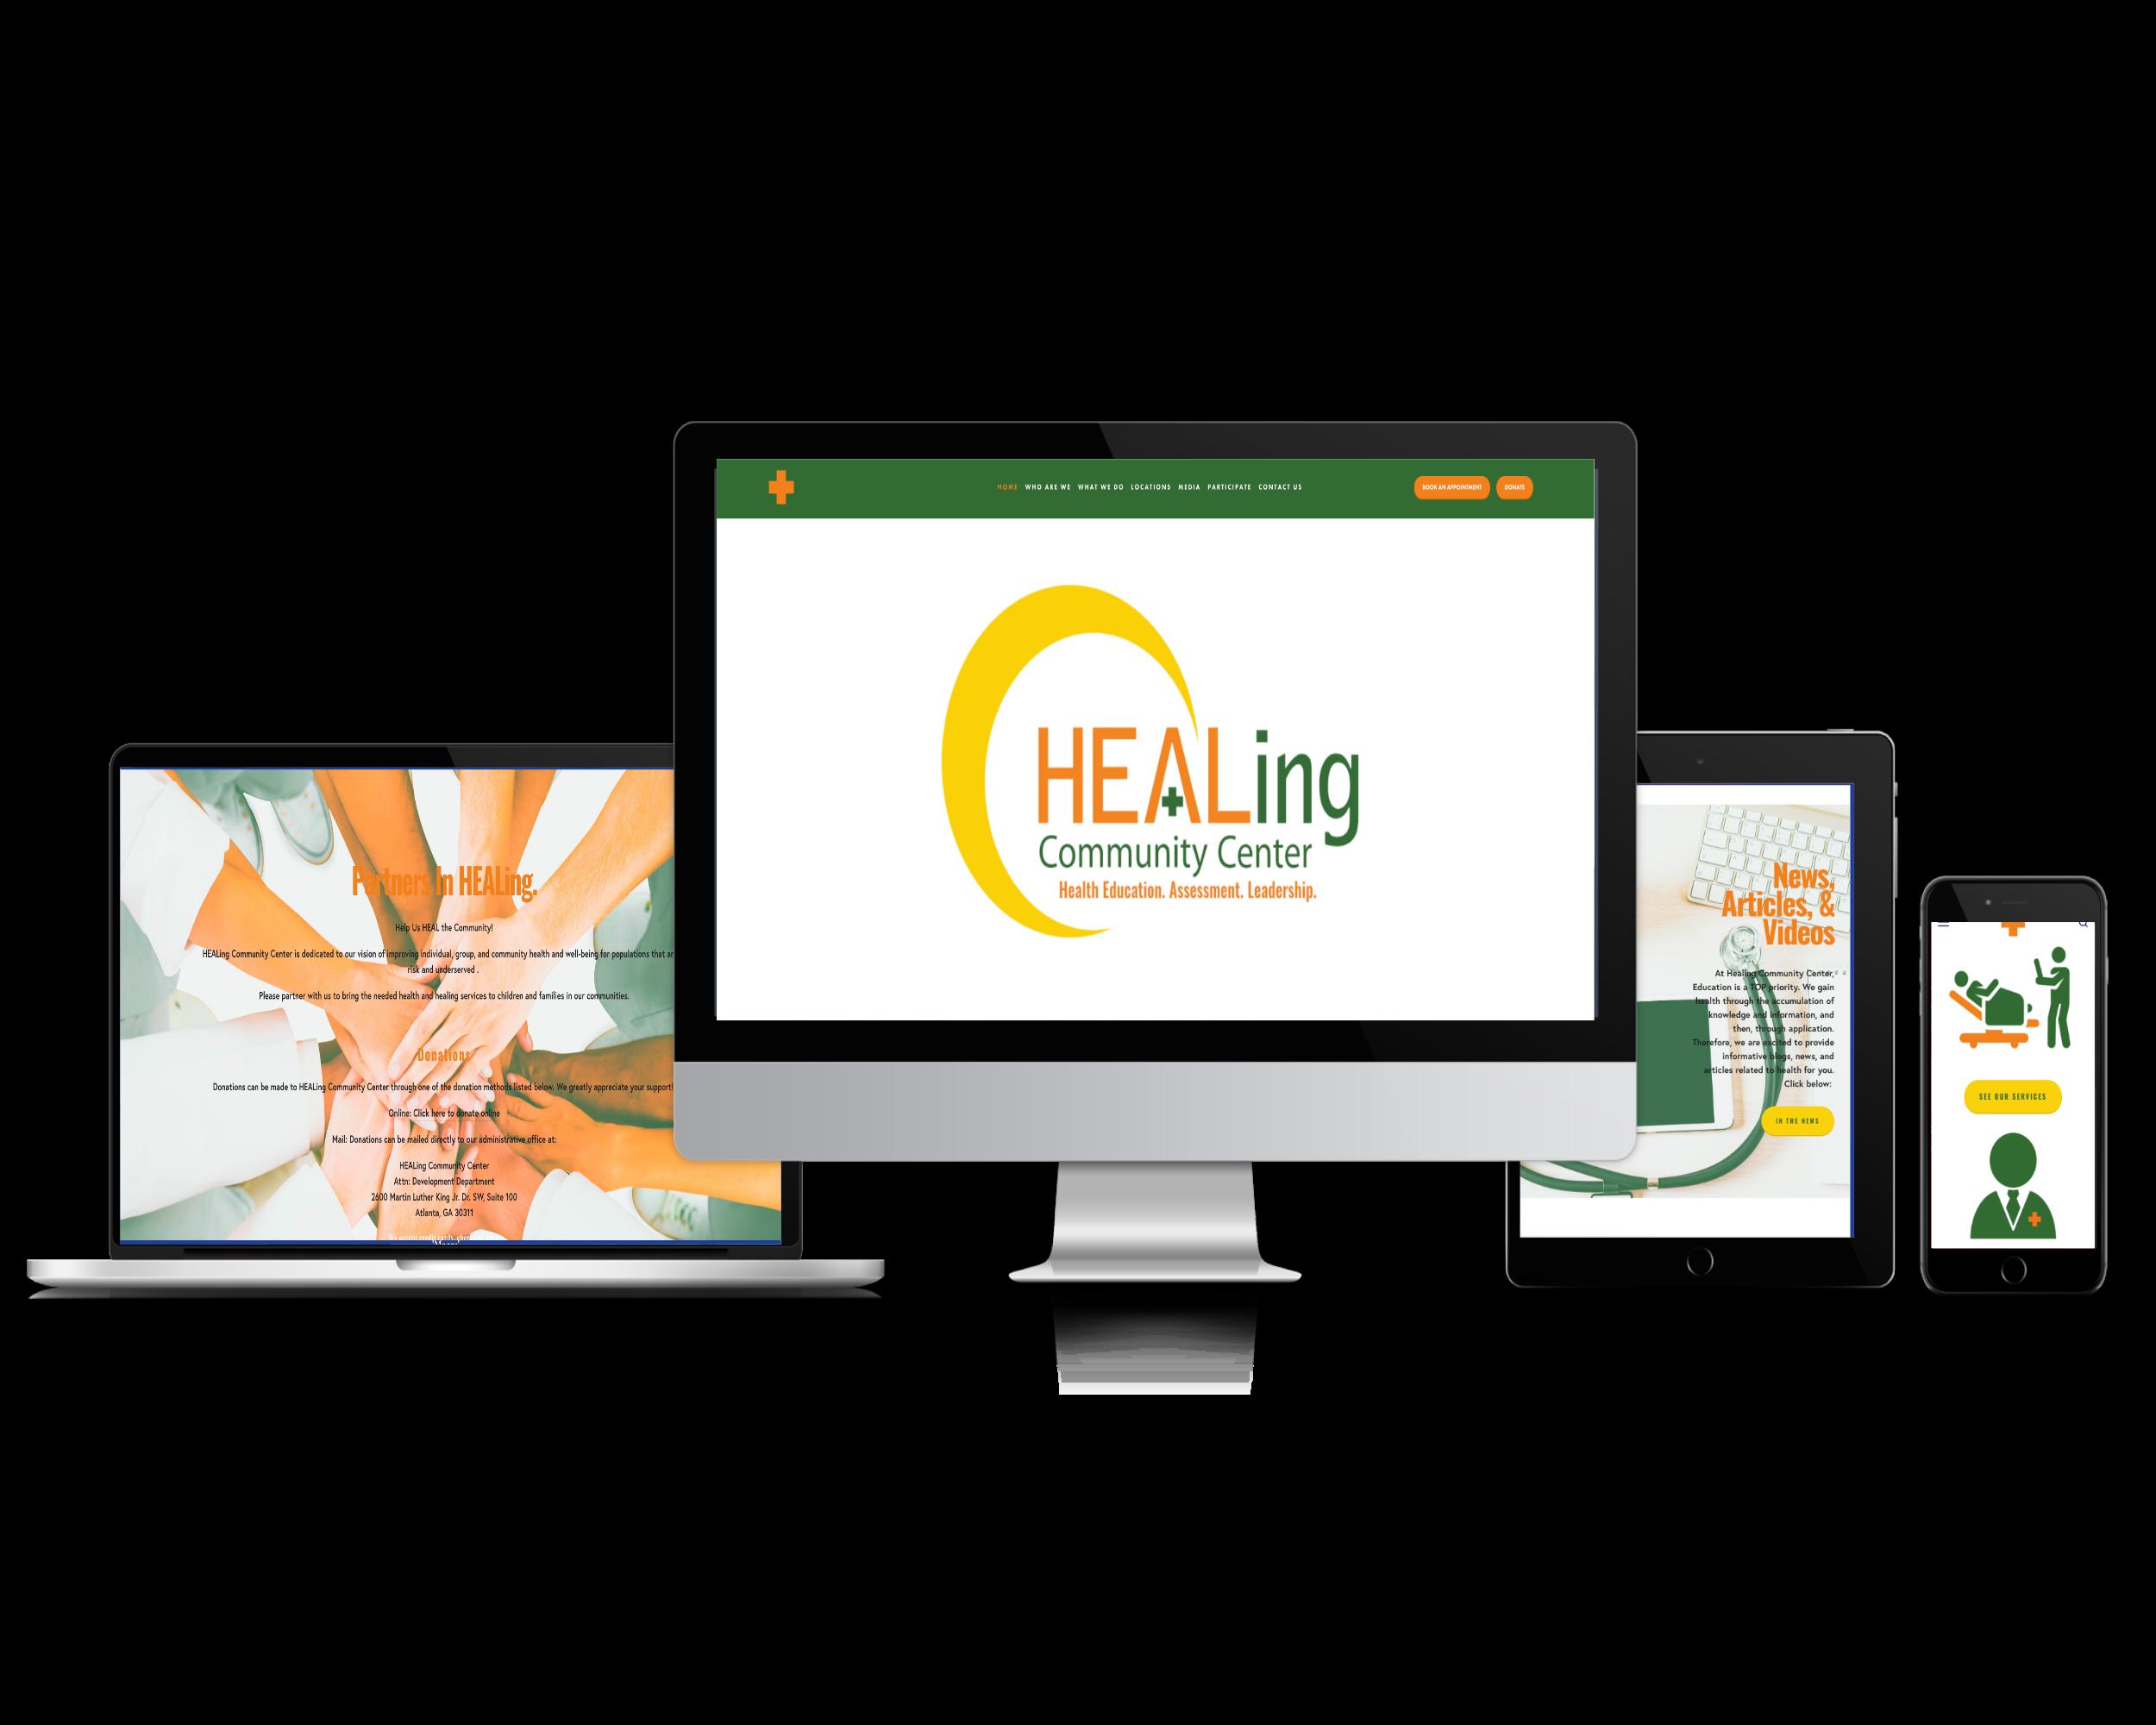 Healing Community Center (Health Center Website)